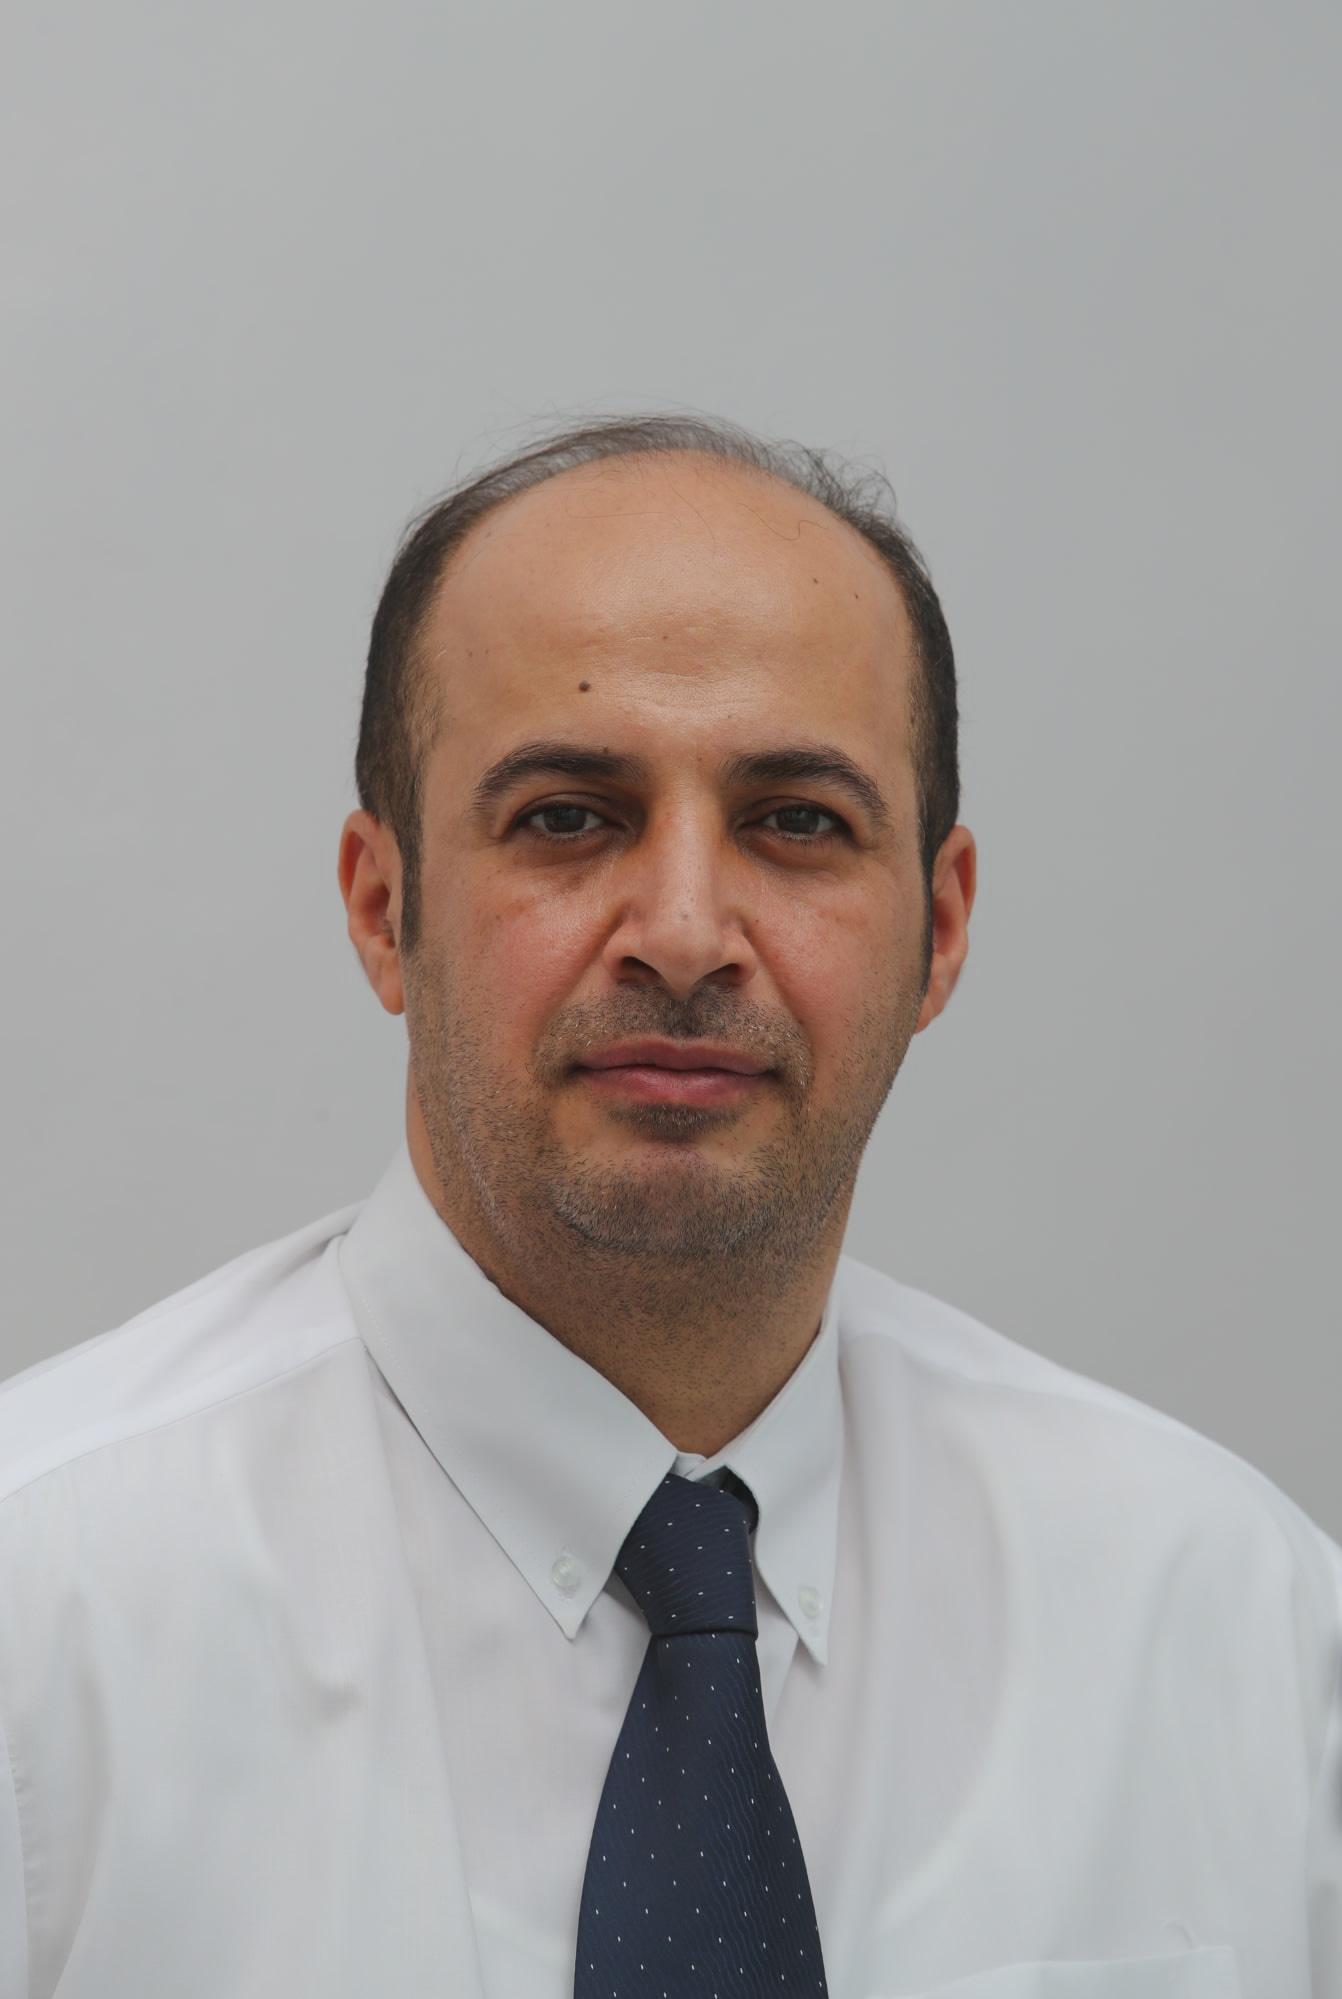 Mohammed Al Maqbali